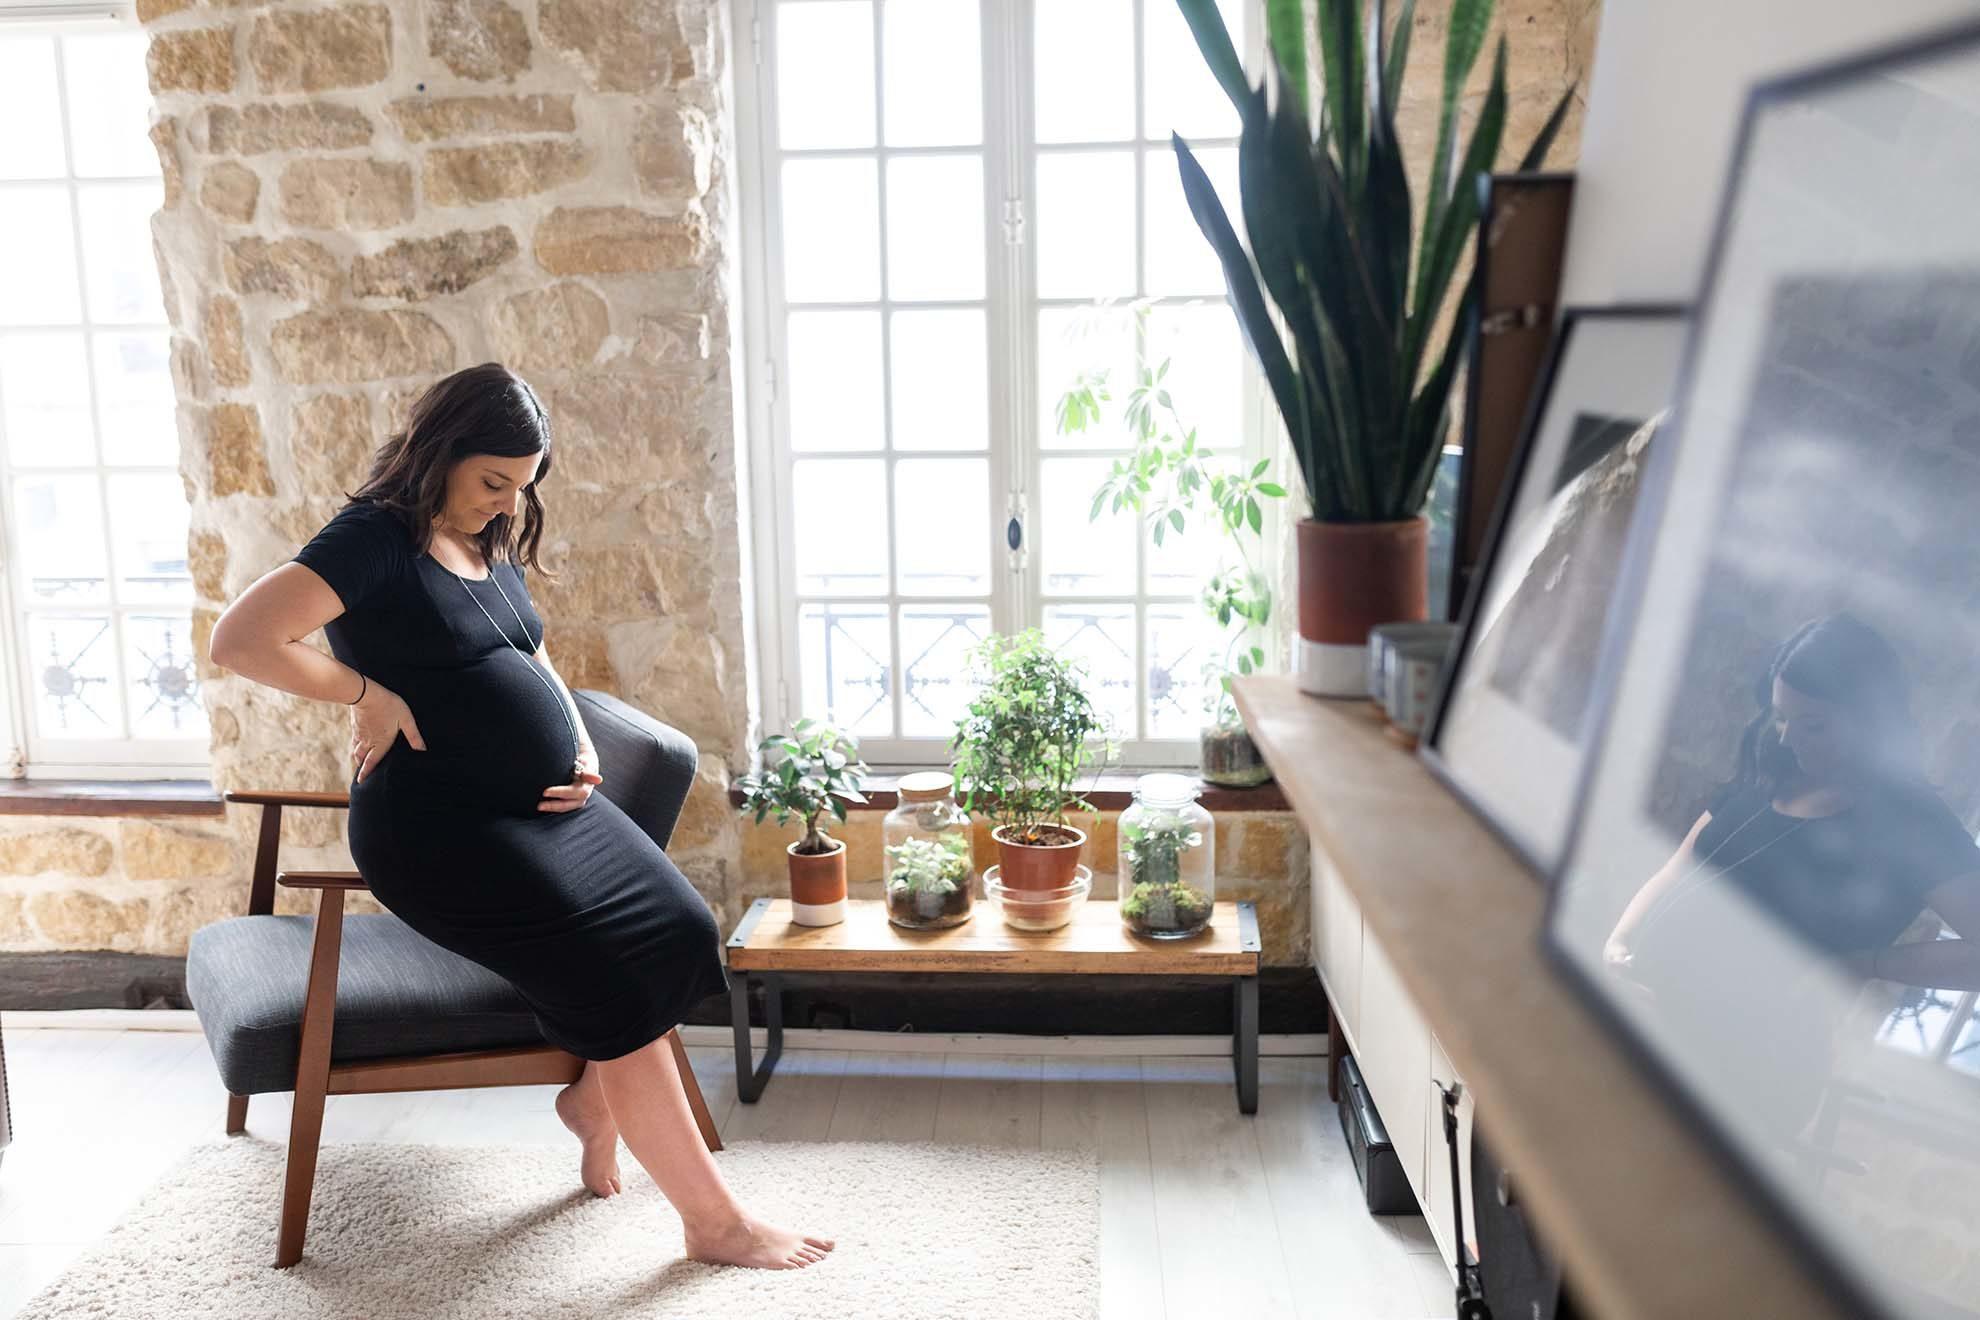 photographe grossesse ile-de-france